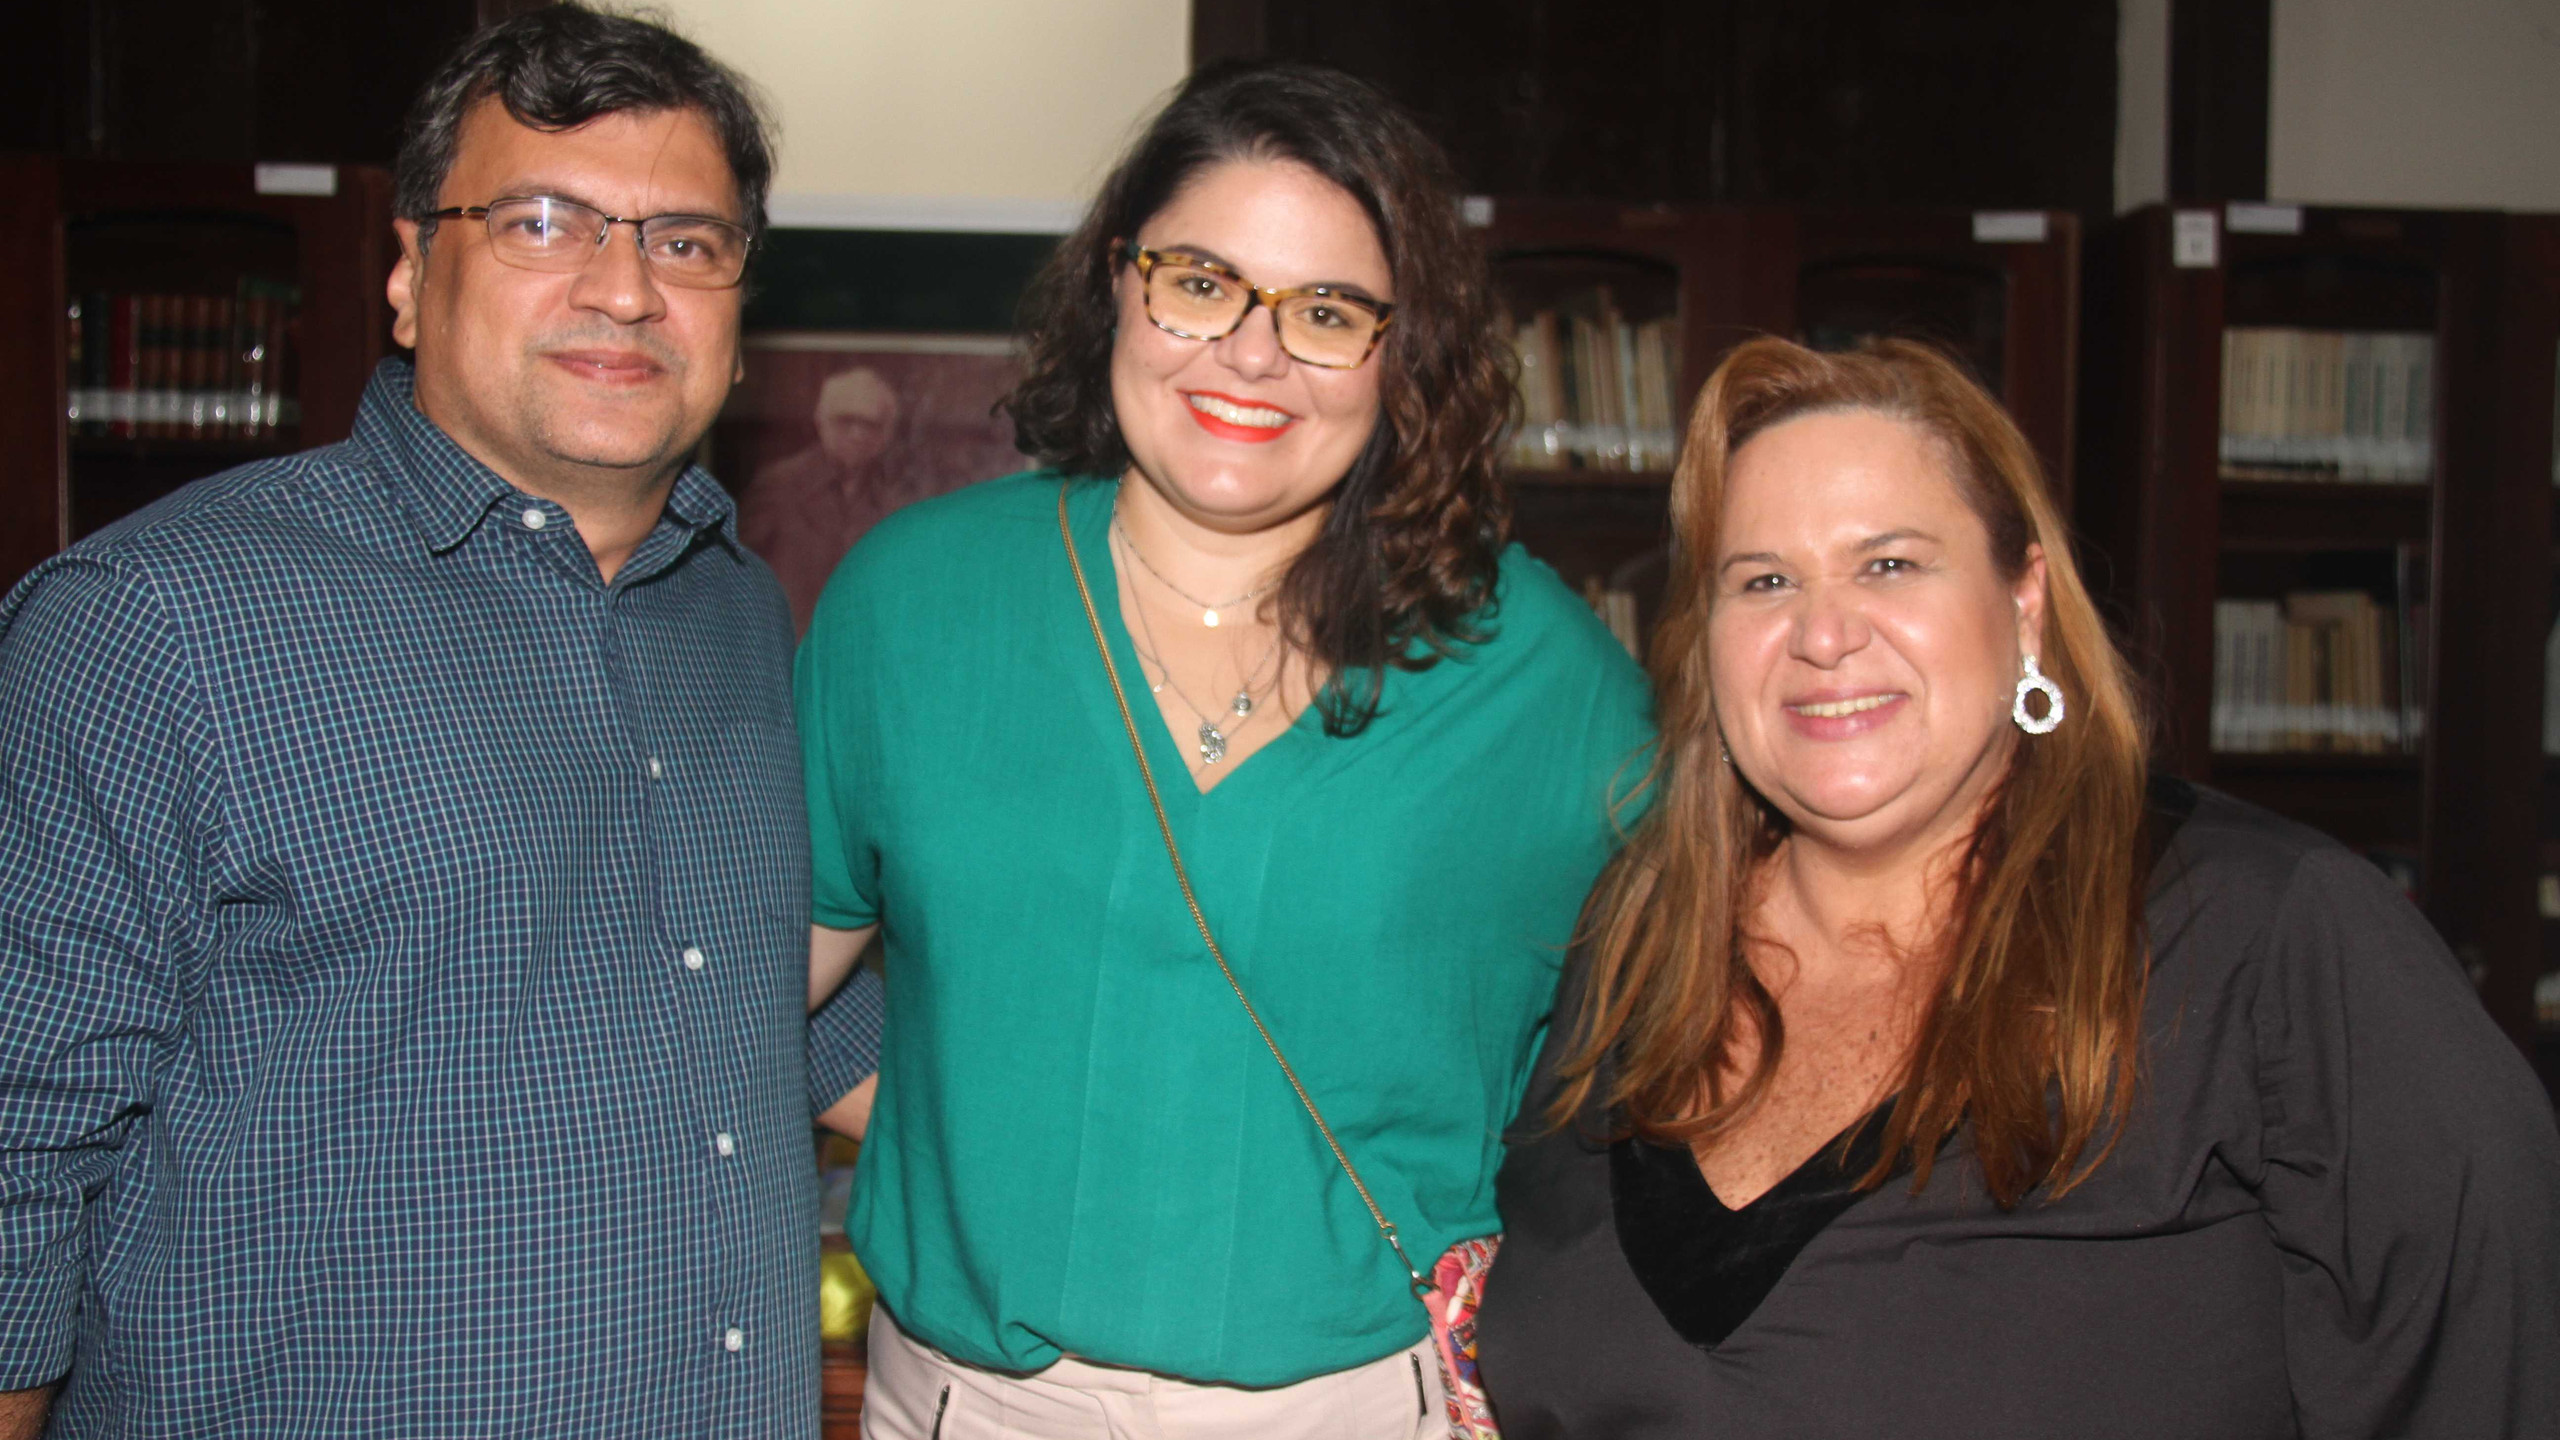 Jornalistas Itevaldo Jr., Roberta Gomes e Danielle Vieira.